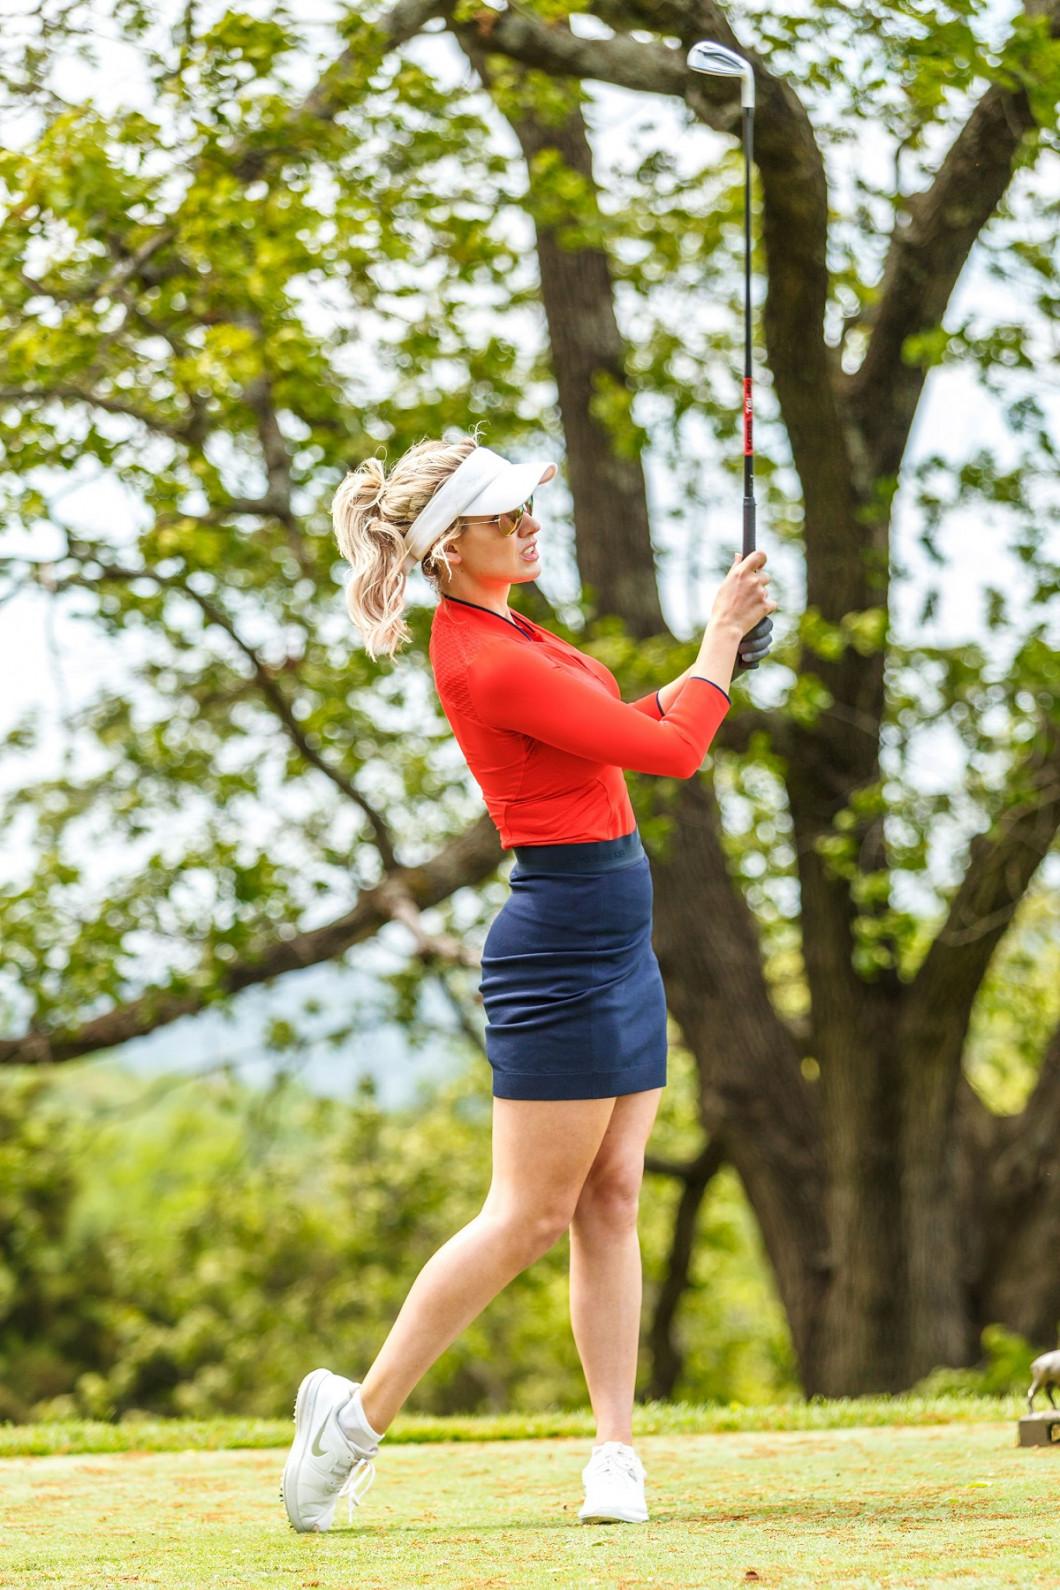 Bass Pro Shops Legends of Golf Tournament at Big Cedar Lodge